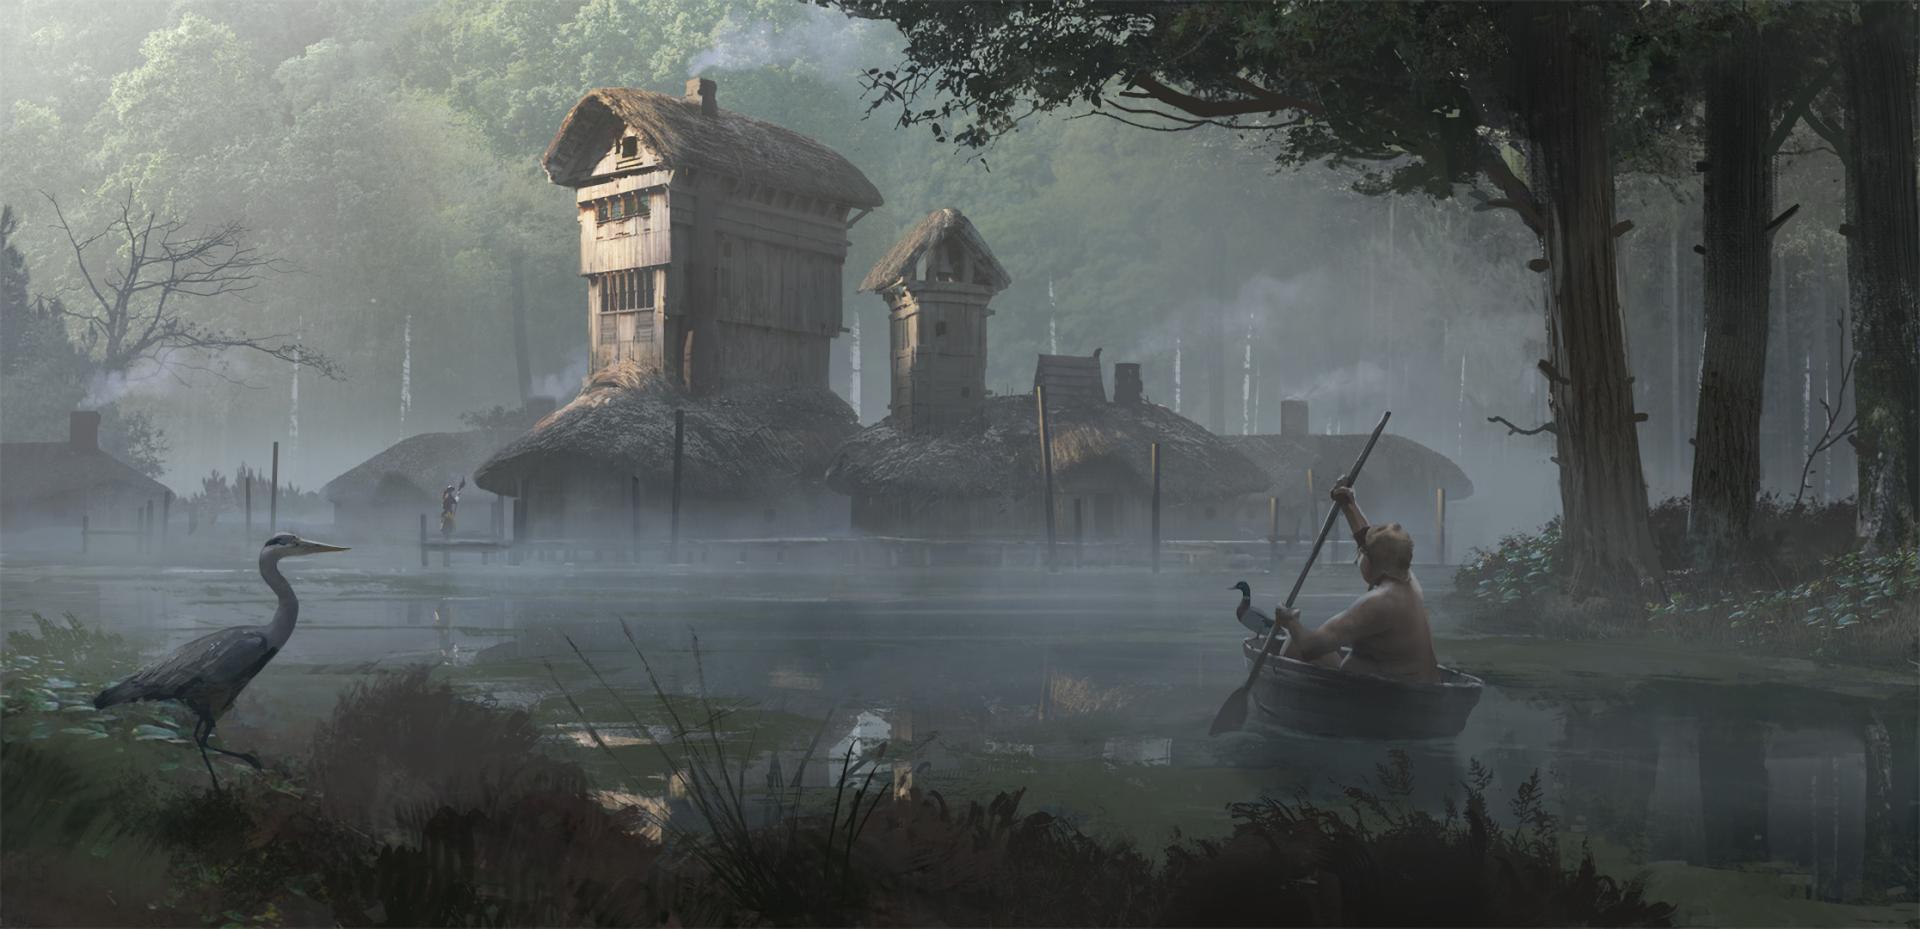 Fantasy - Landscape  Dark River House Tree Fog Heron Wallpaper